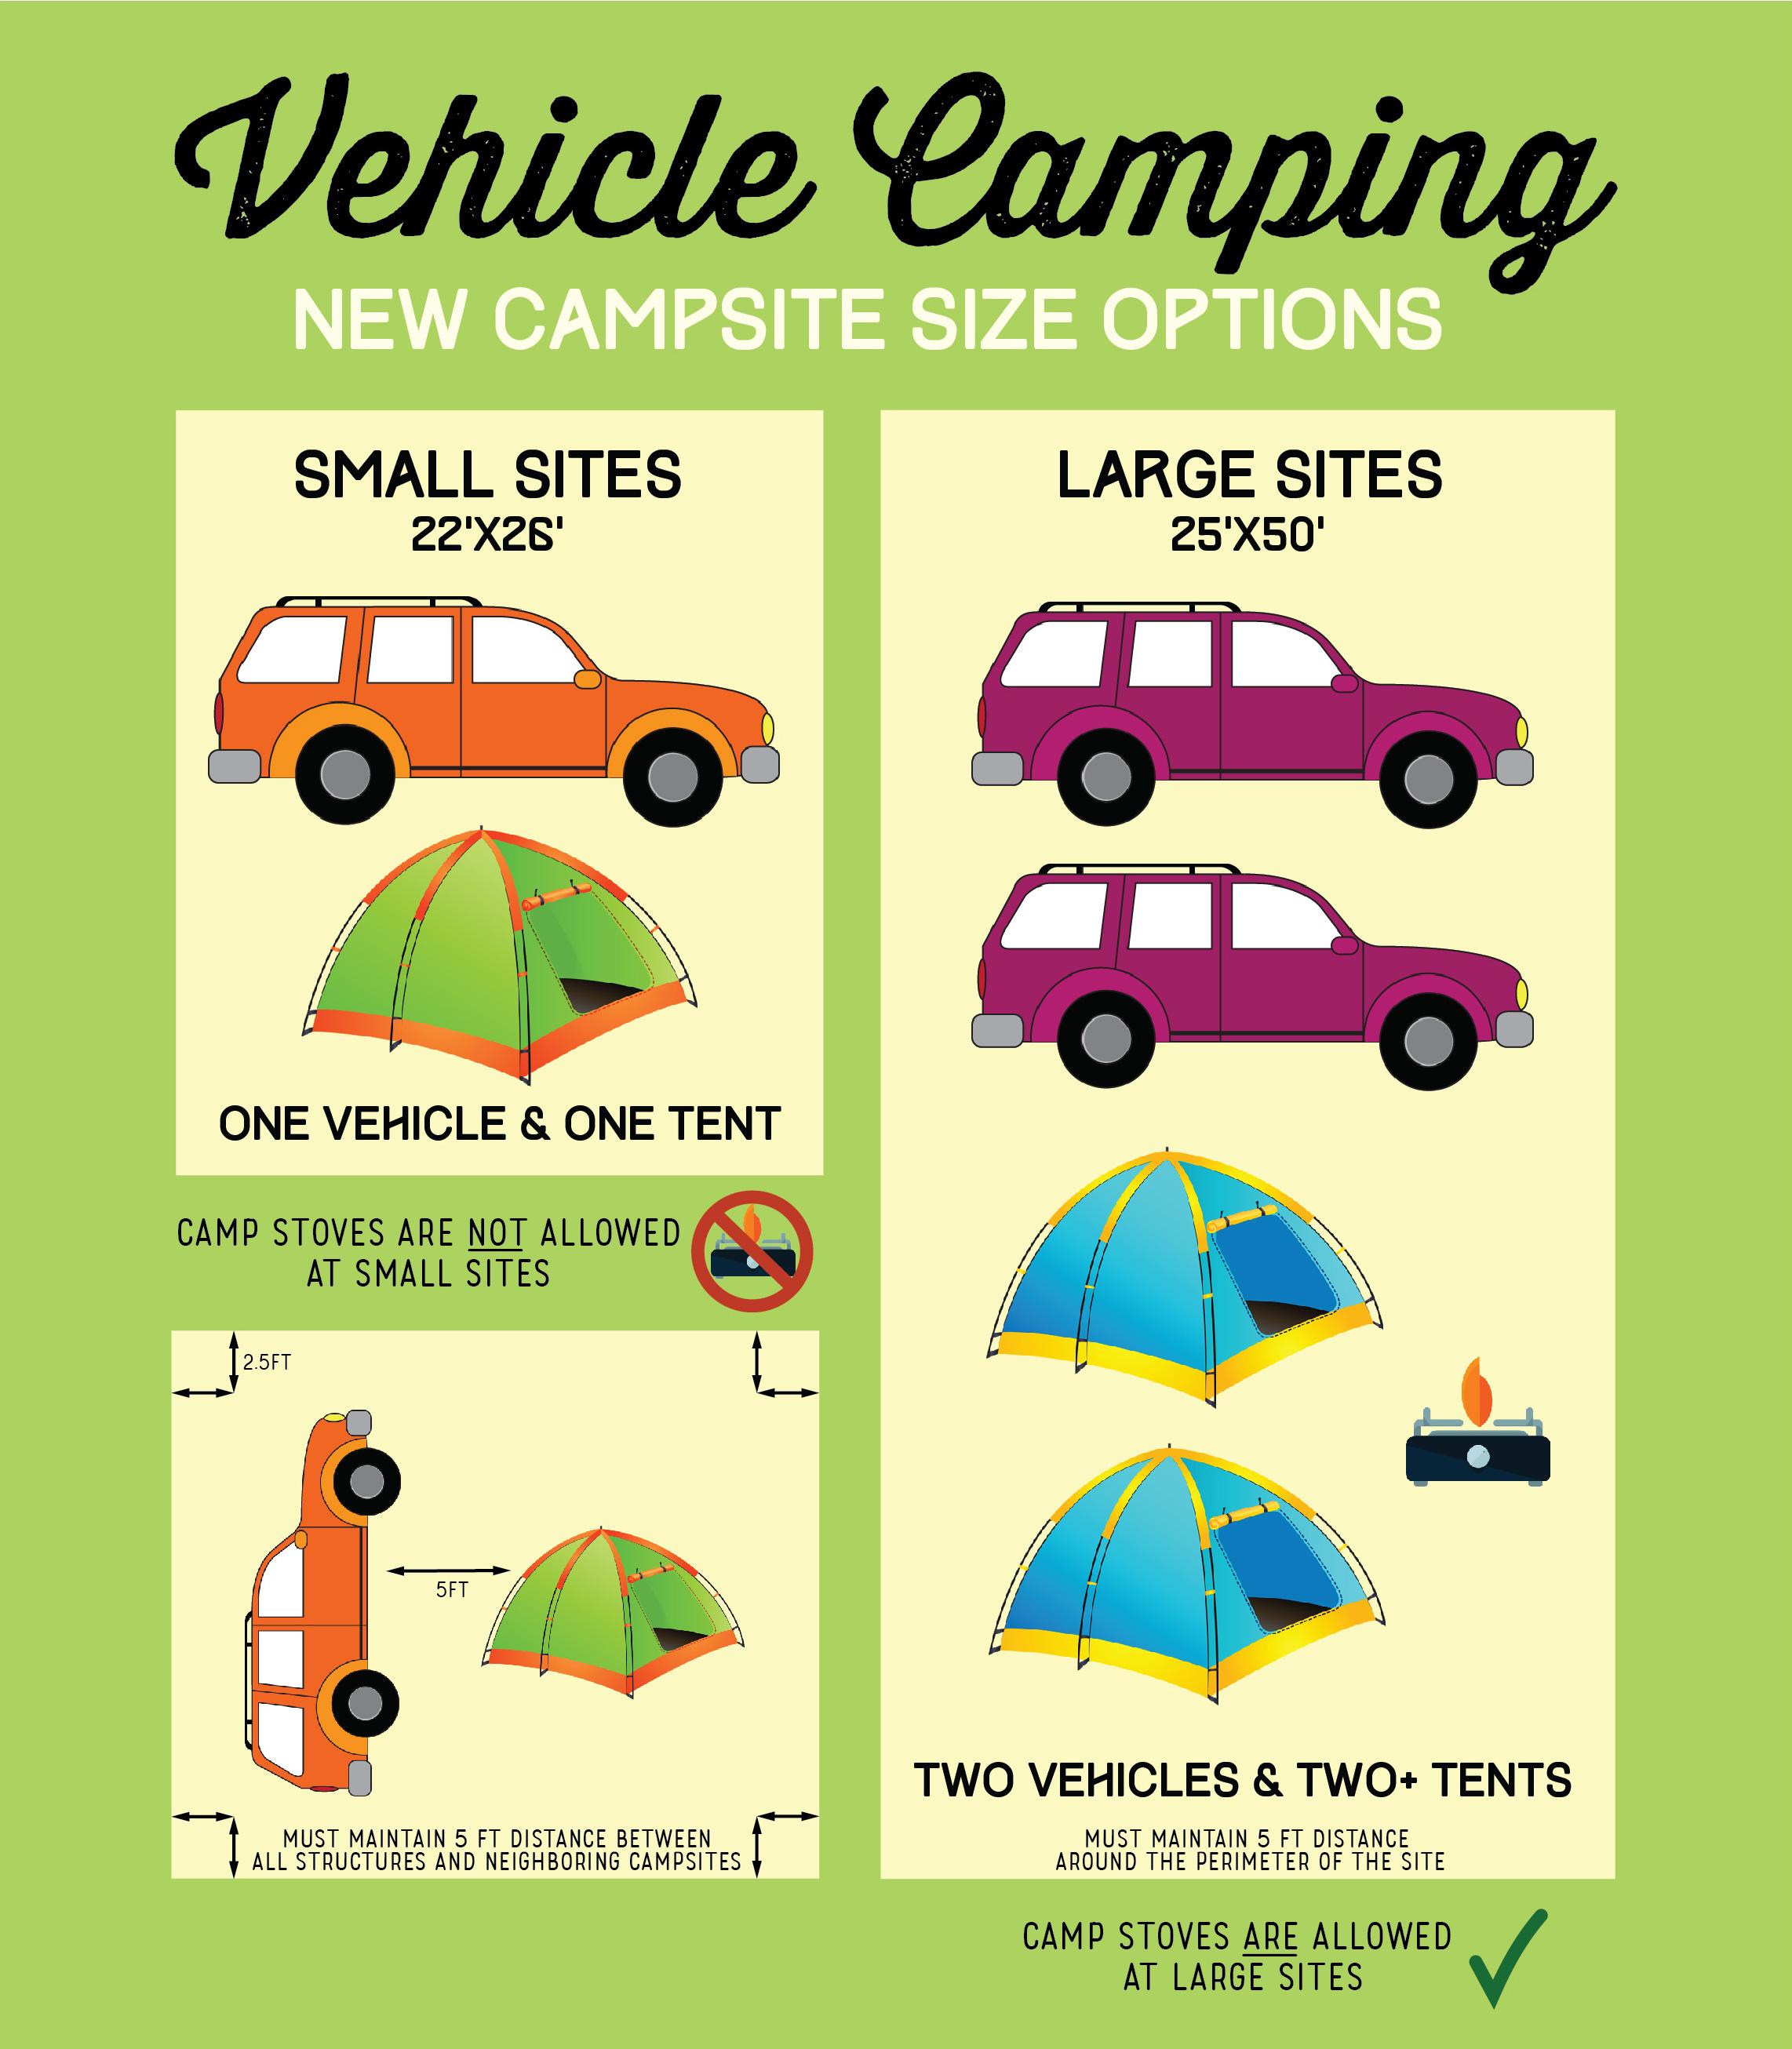 ATW-Vehicle_Camping-to.jpg